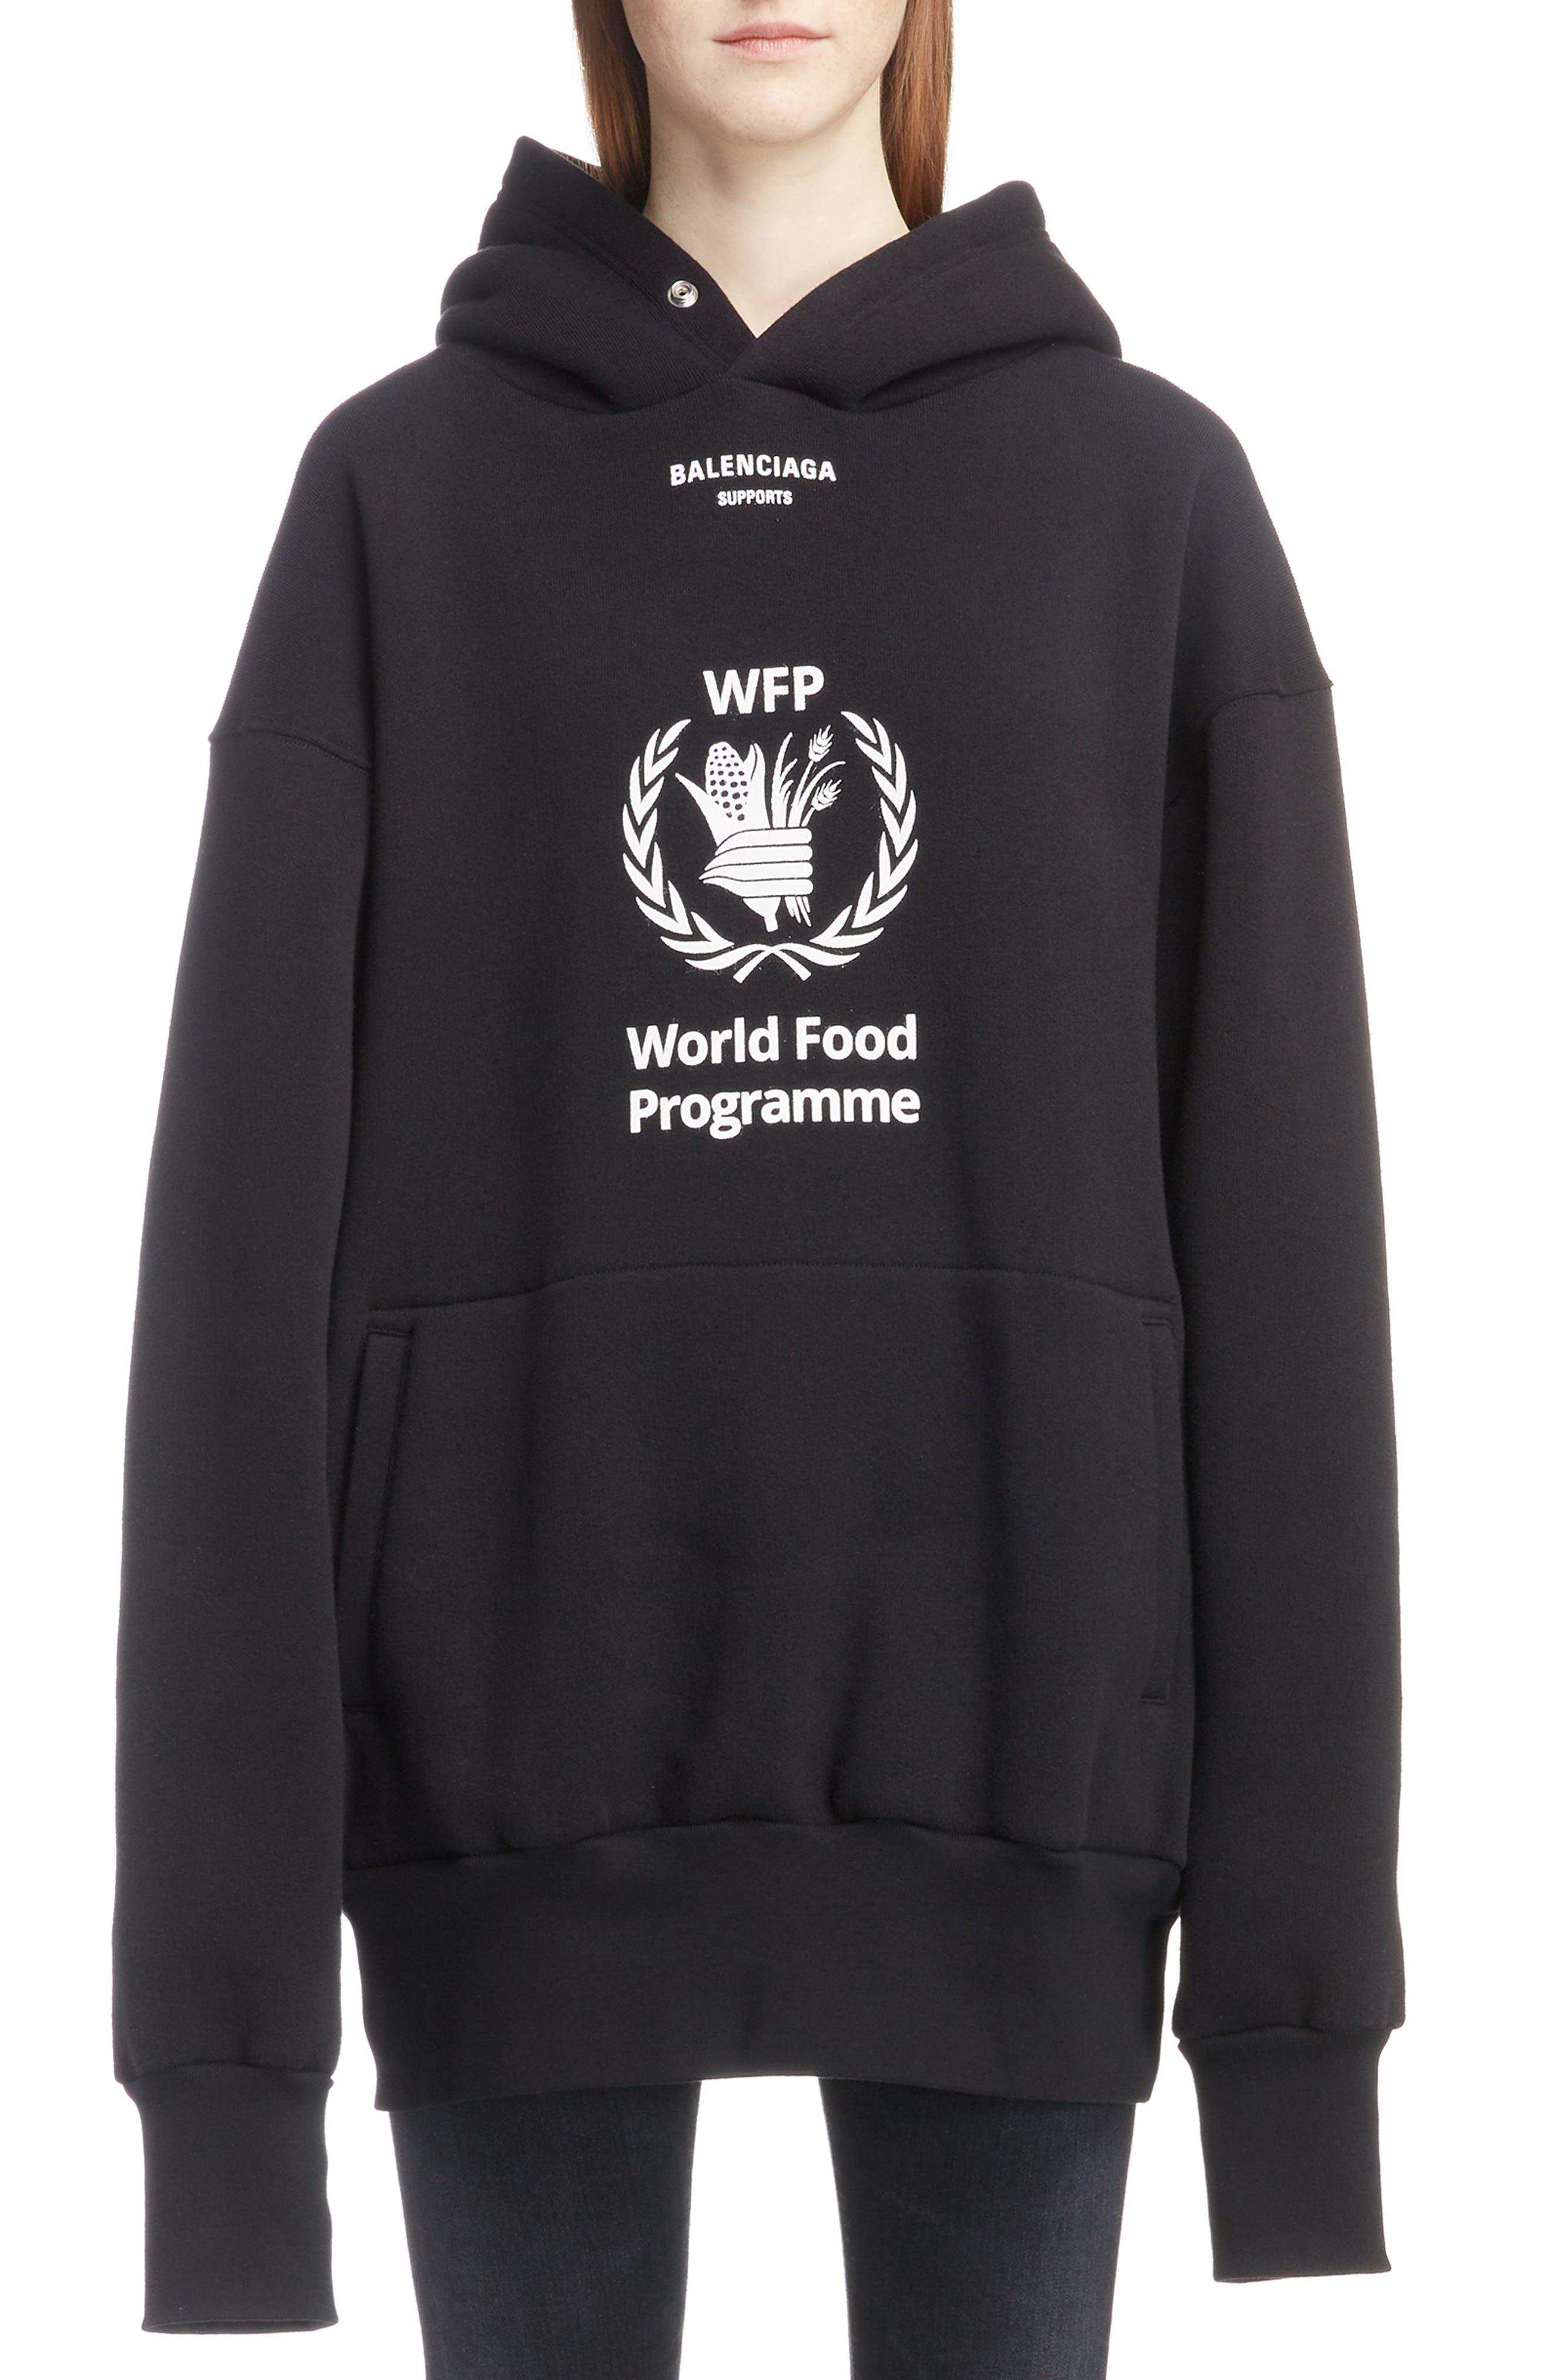 World Food Programme Oversize Brushed Felt Hoodie,                         Main,                         color, 1070-BLACK/ WHITE